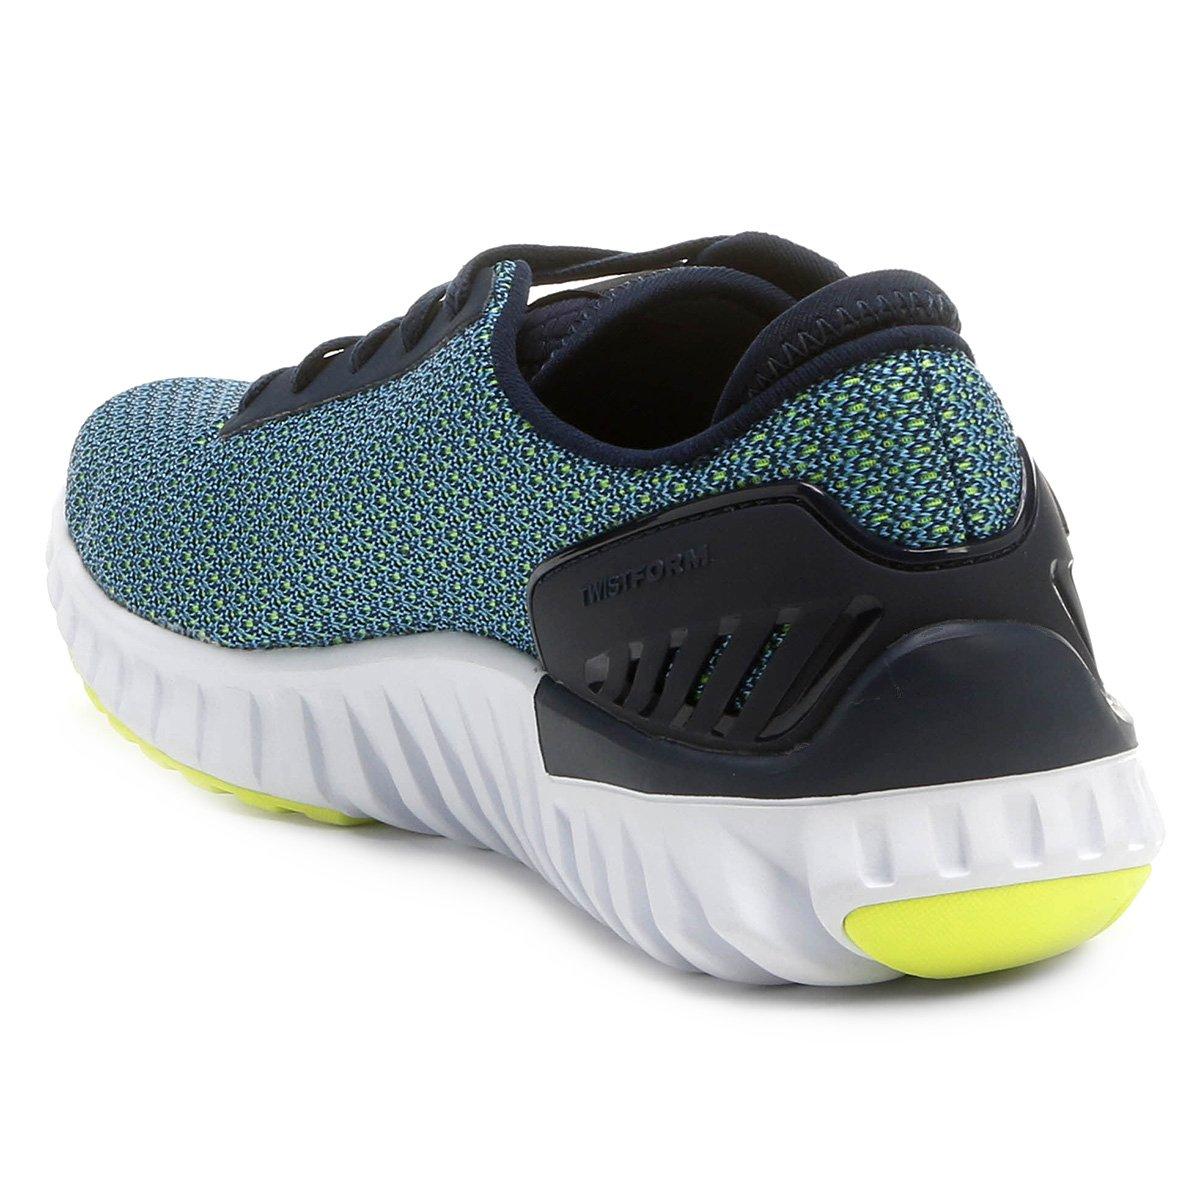 ... Tênis Reebok Twistform 3.0 Masculino - Compre Agora Netshoes  205982009910e7 ... d0bb05762d74f